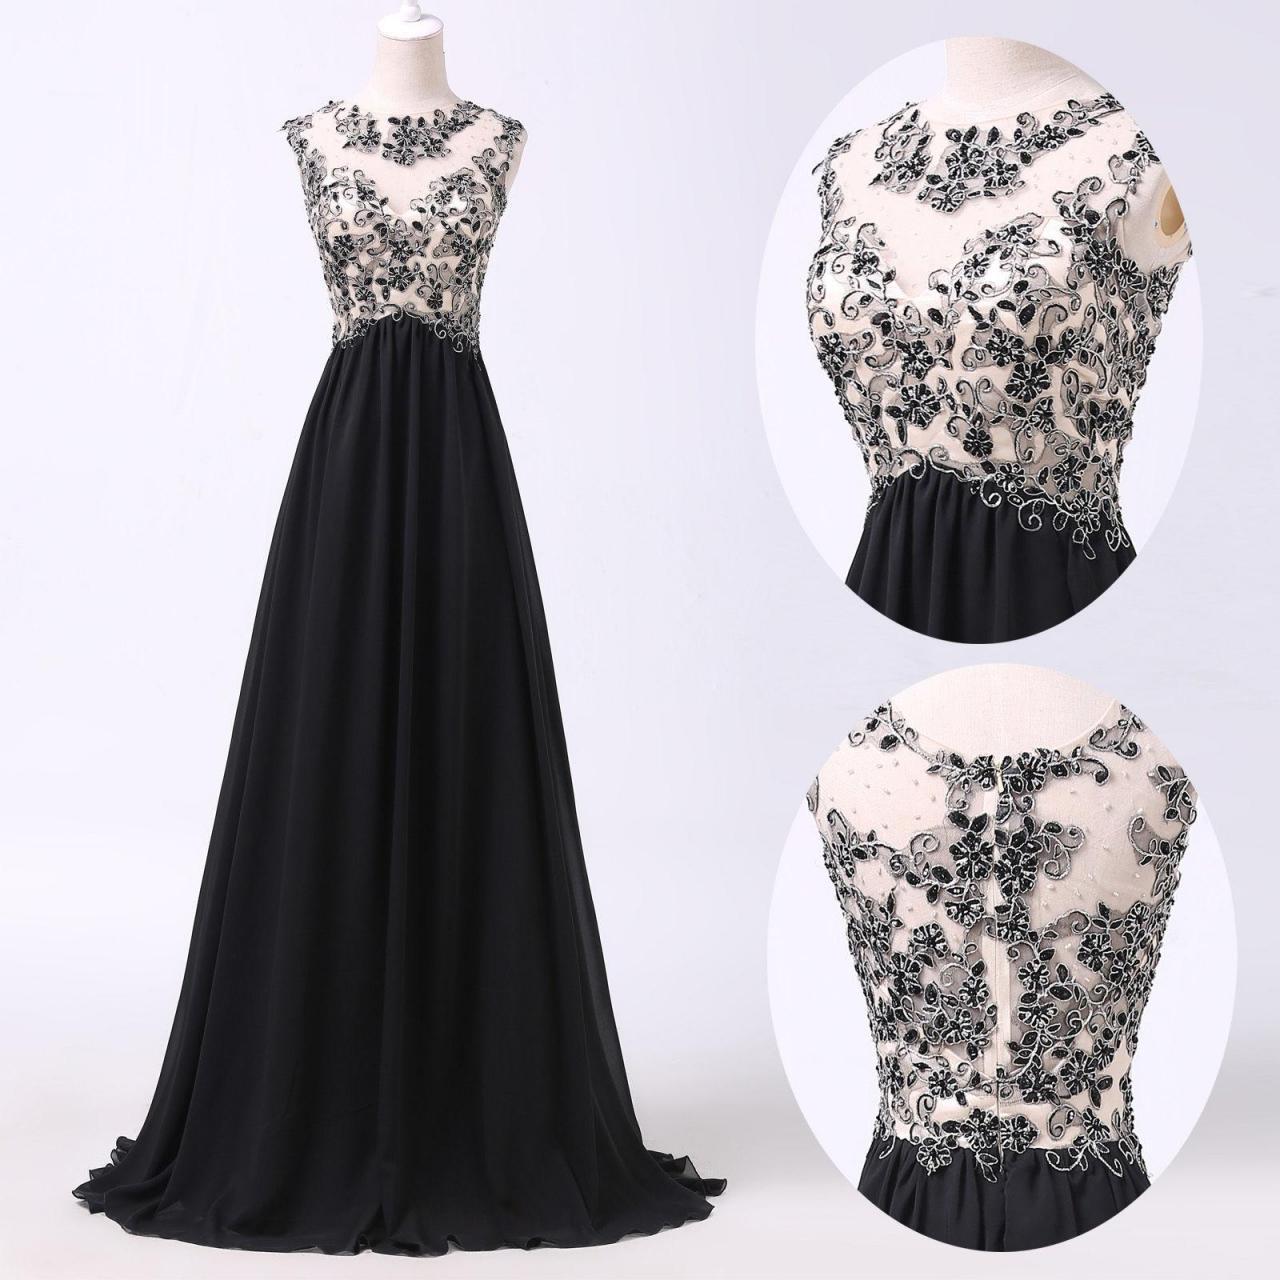 simple dresses a line prom dresses,black lace prom dress,simple prom dress,modest evening  gowns,cheap party hpivmye